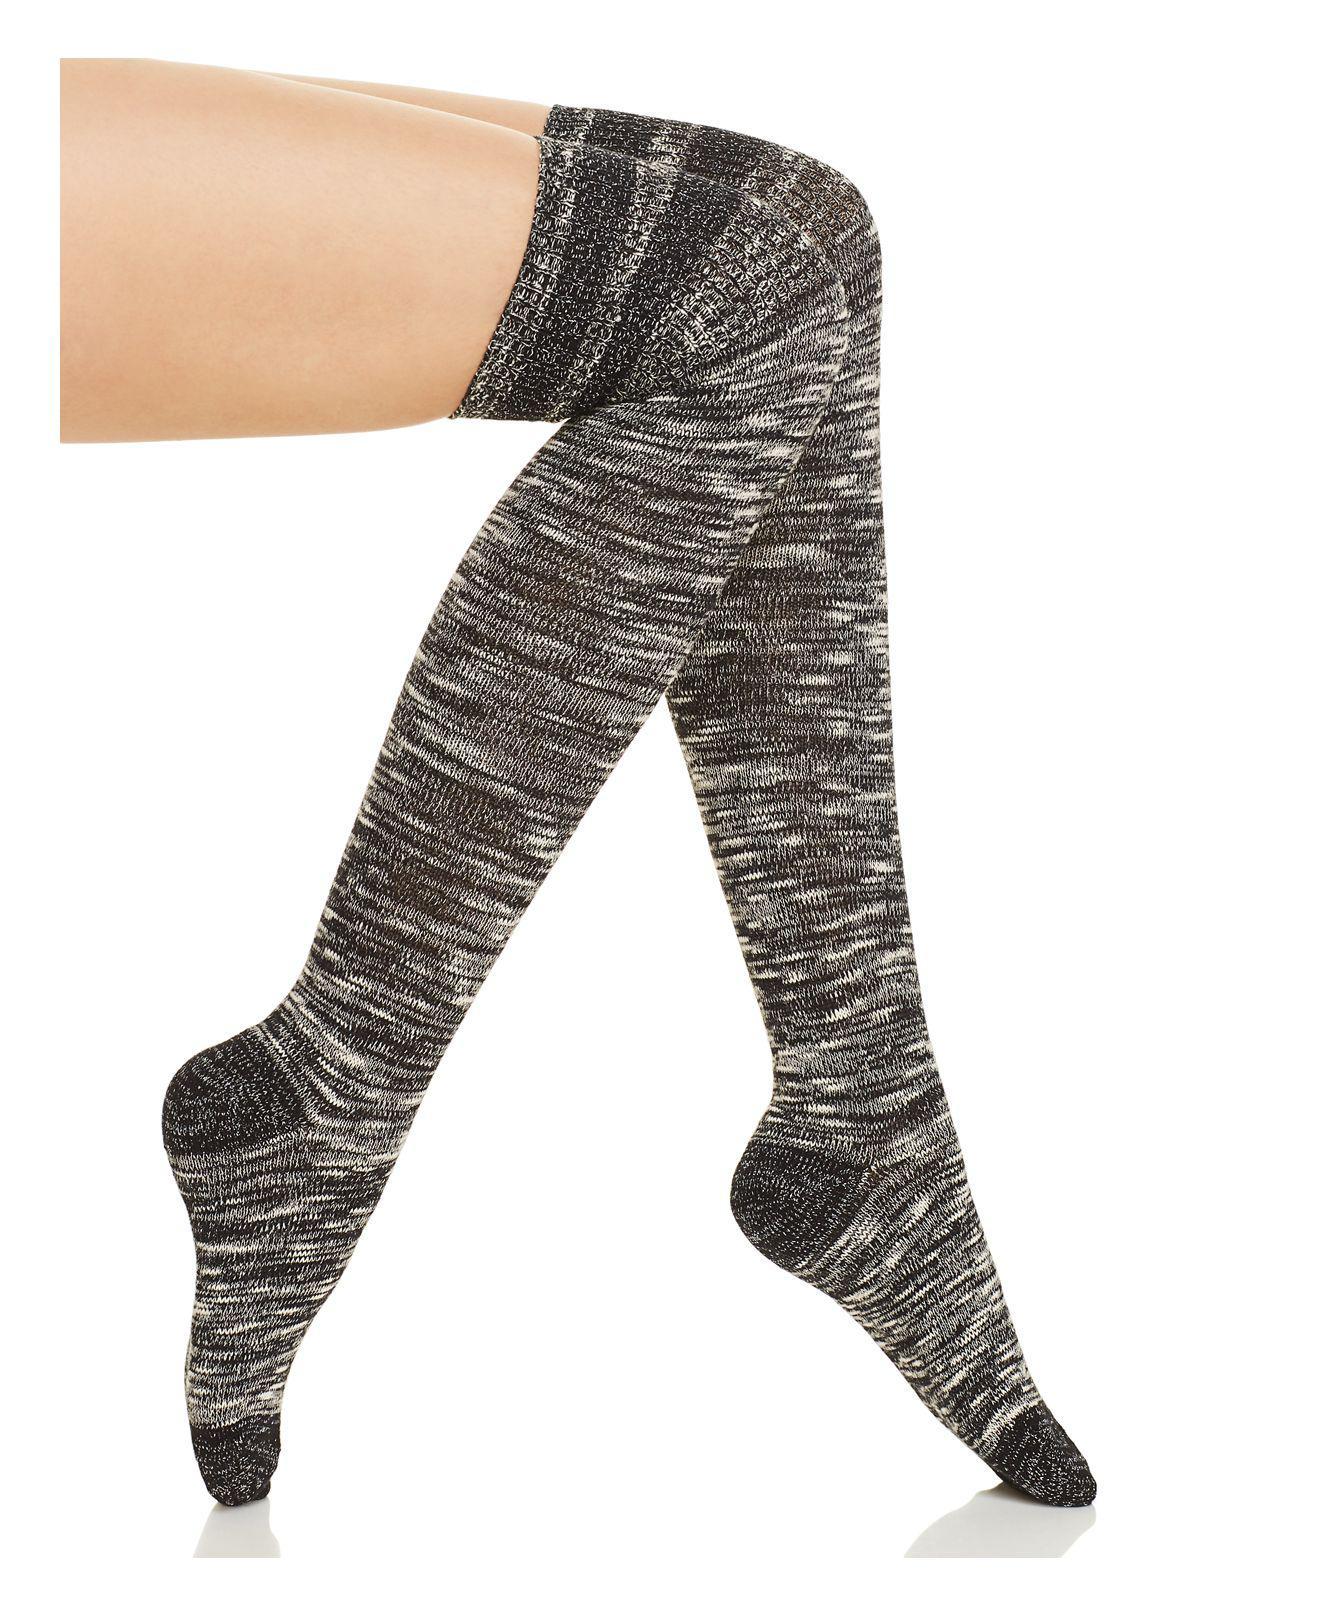 16bfb1aca56 Lyst - Hue Metallic Stripe Chunky Slub Over-the-knee Socks in Black